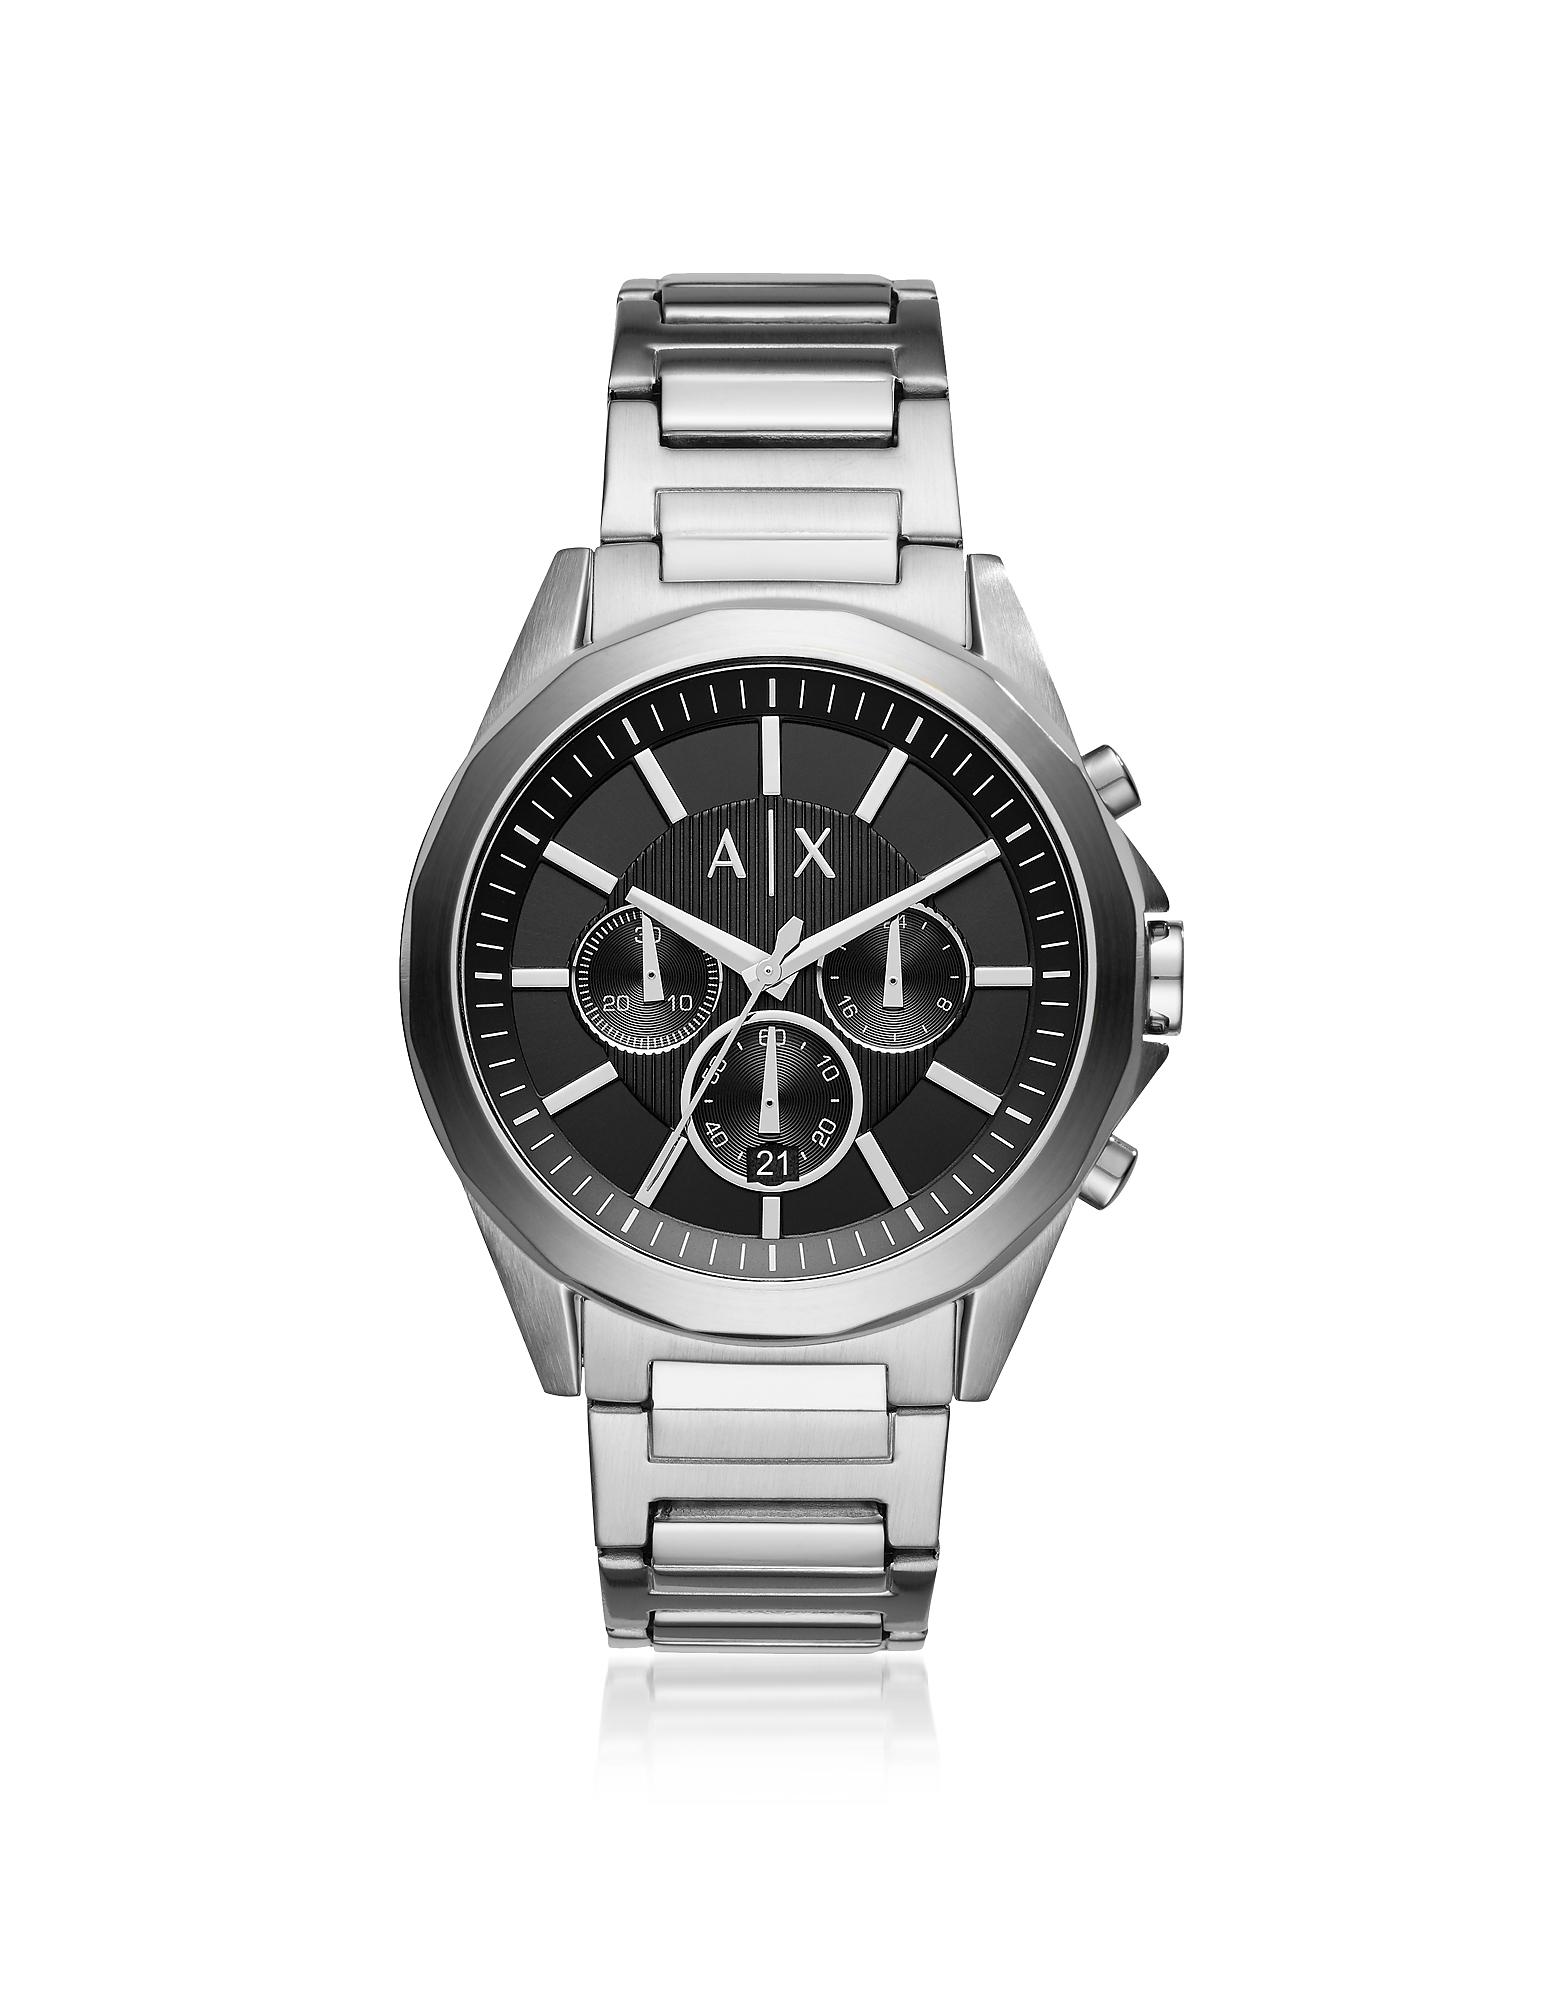 Drexler Black Dial and Silver Tone Men's Chronograph Watch